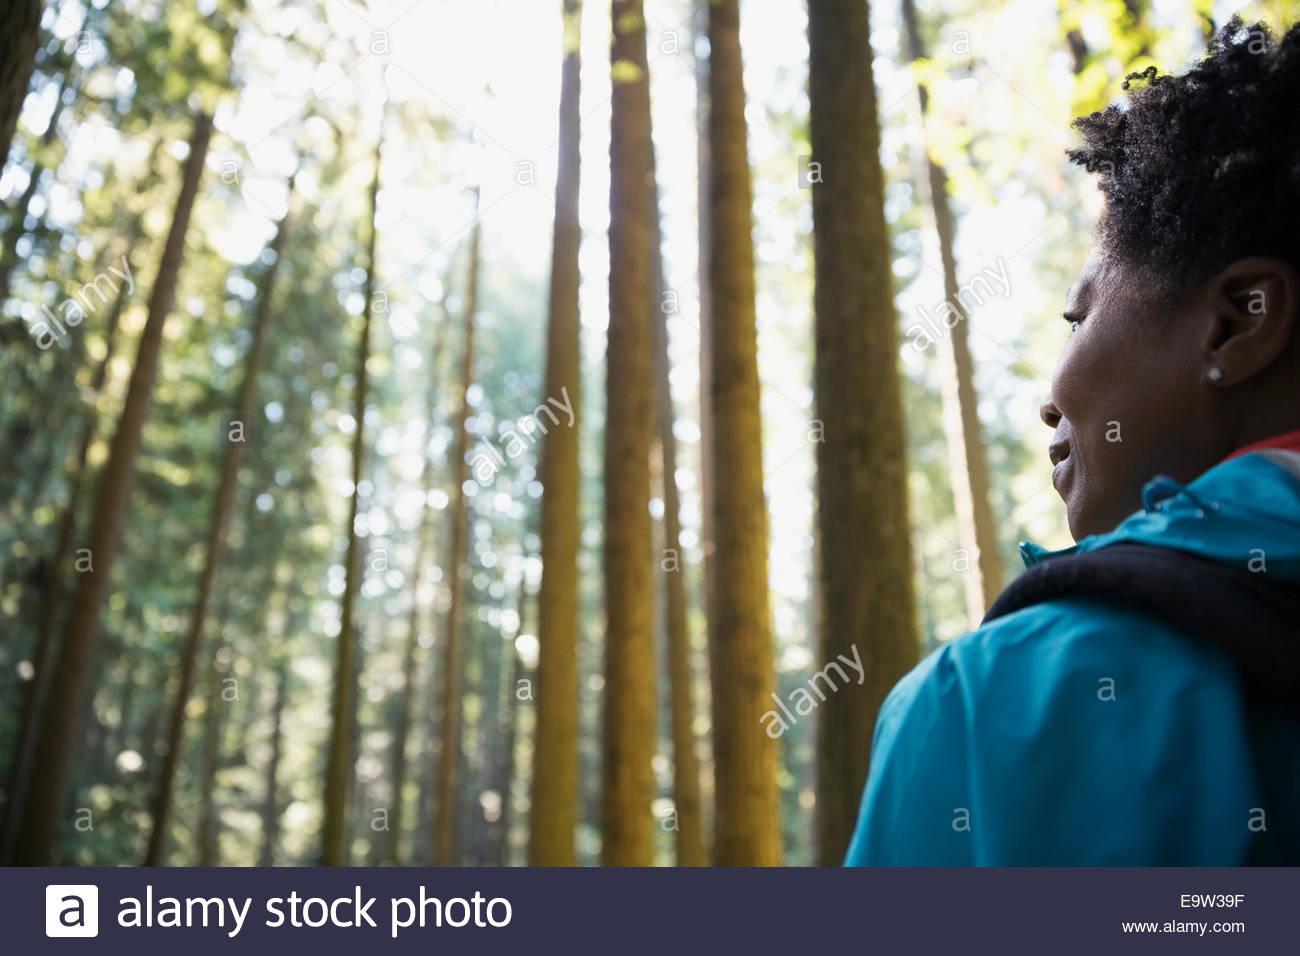 Pensive woman looking at arbres en bois Photo Stock